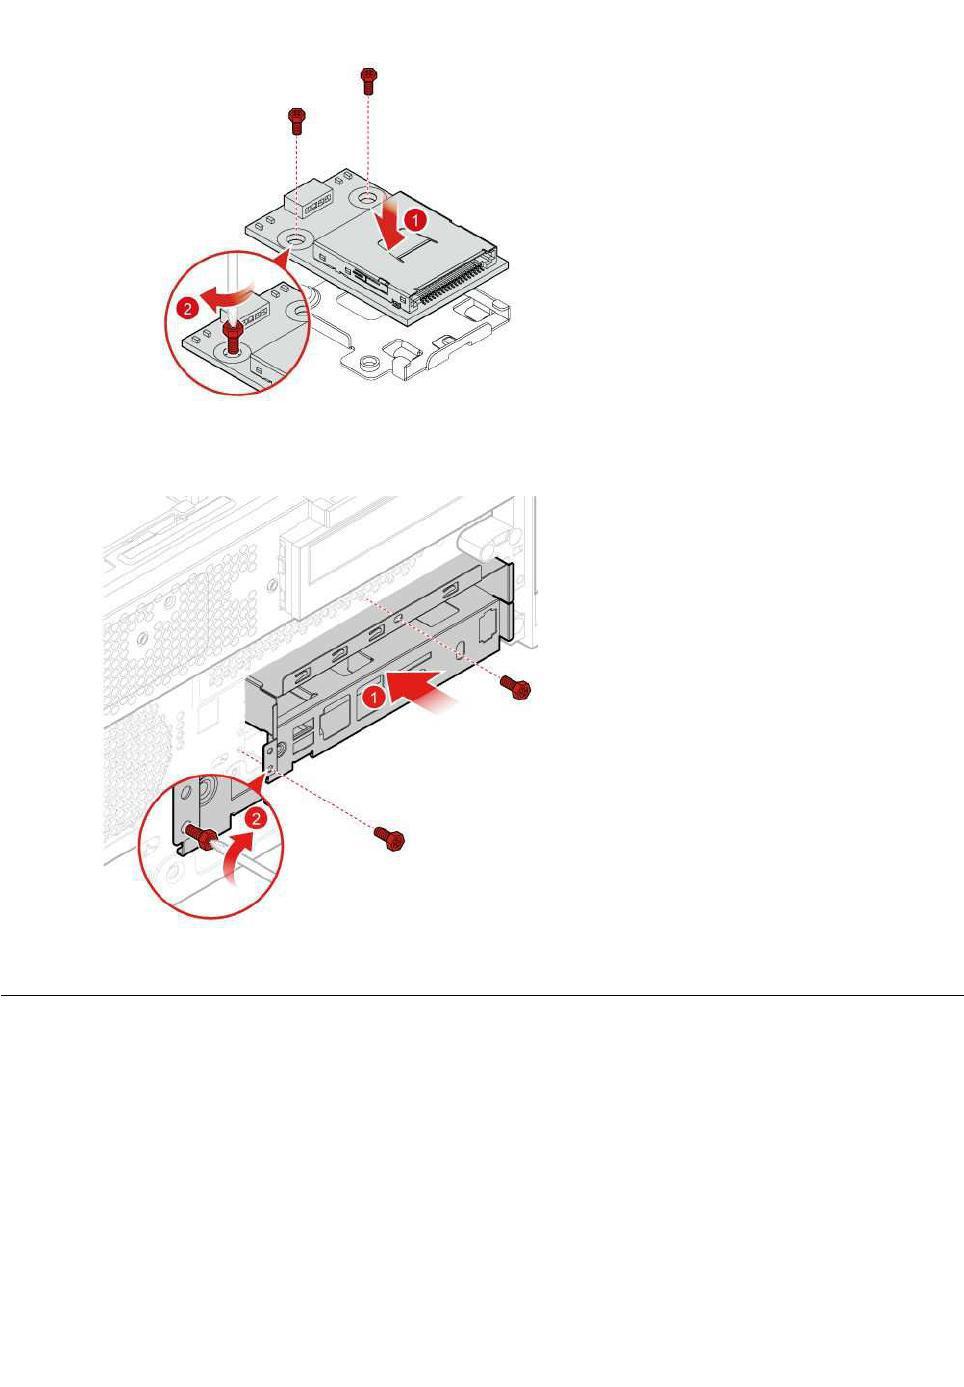 Lenovo IdeaCentre 720 Hardware Maintenance Manual Download